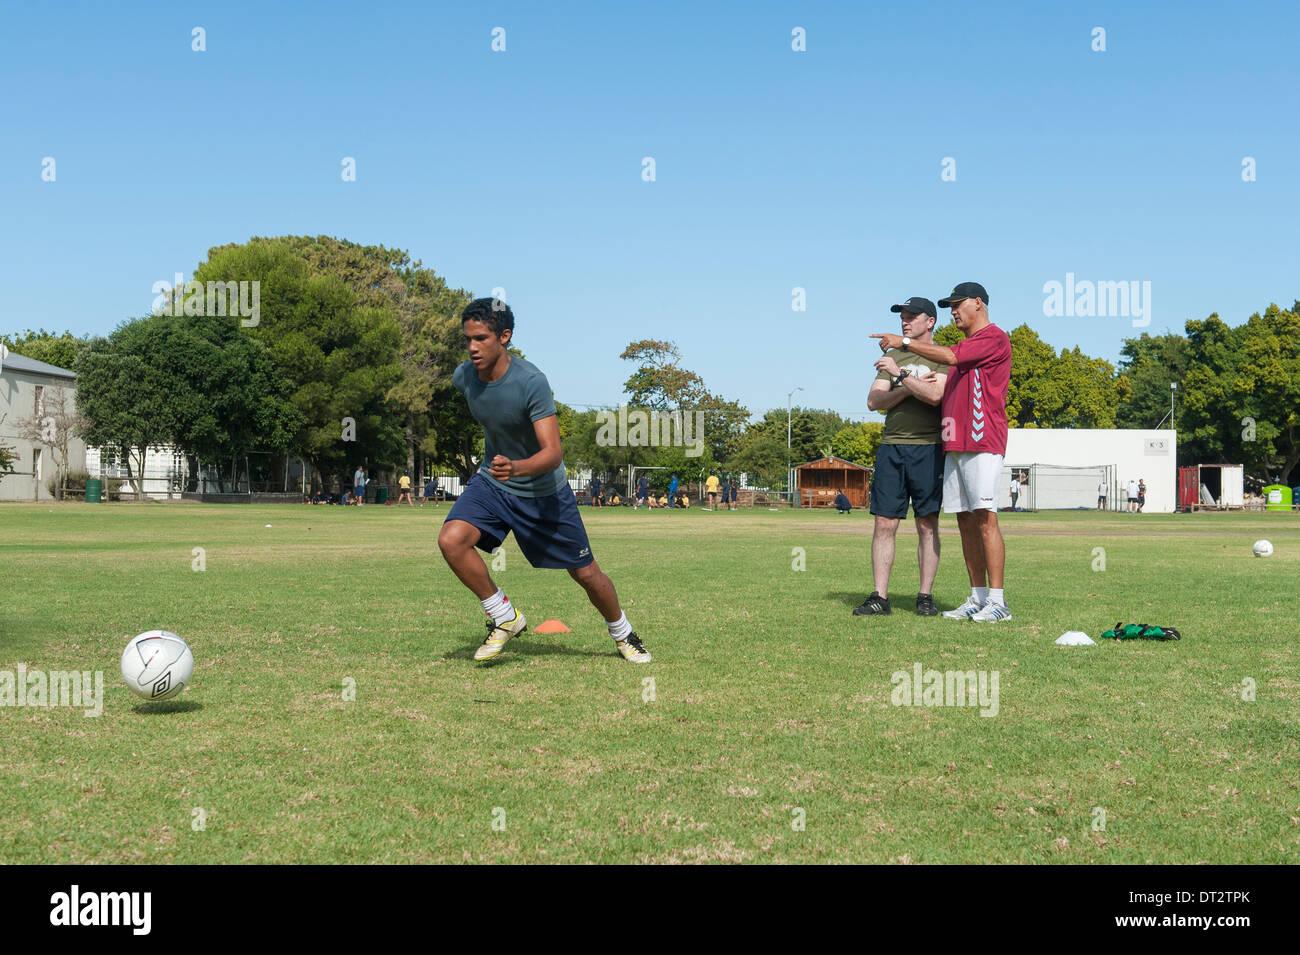 Fußballtraining am Groote Schuur High School, Cape Town, Western Cape, Südafrika Stockbild